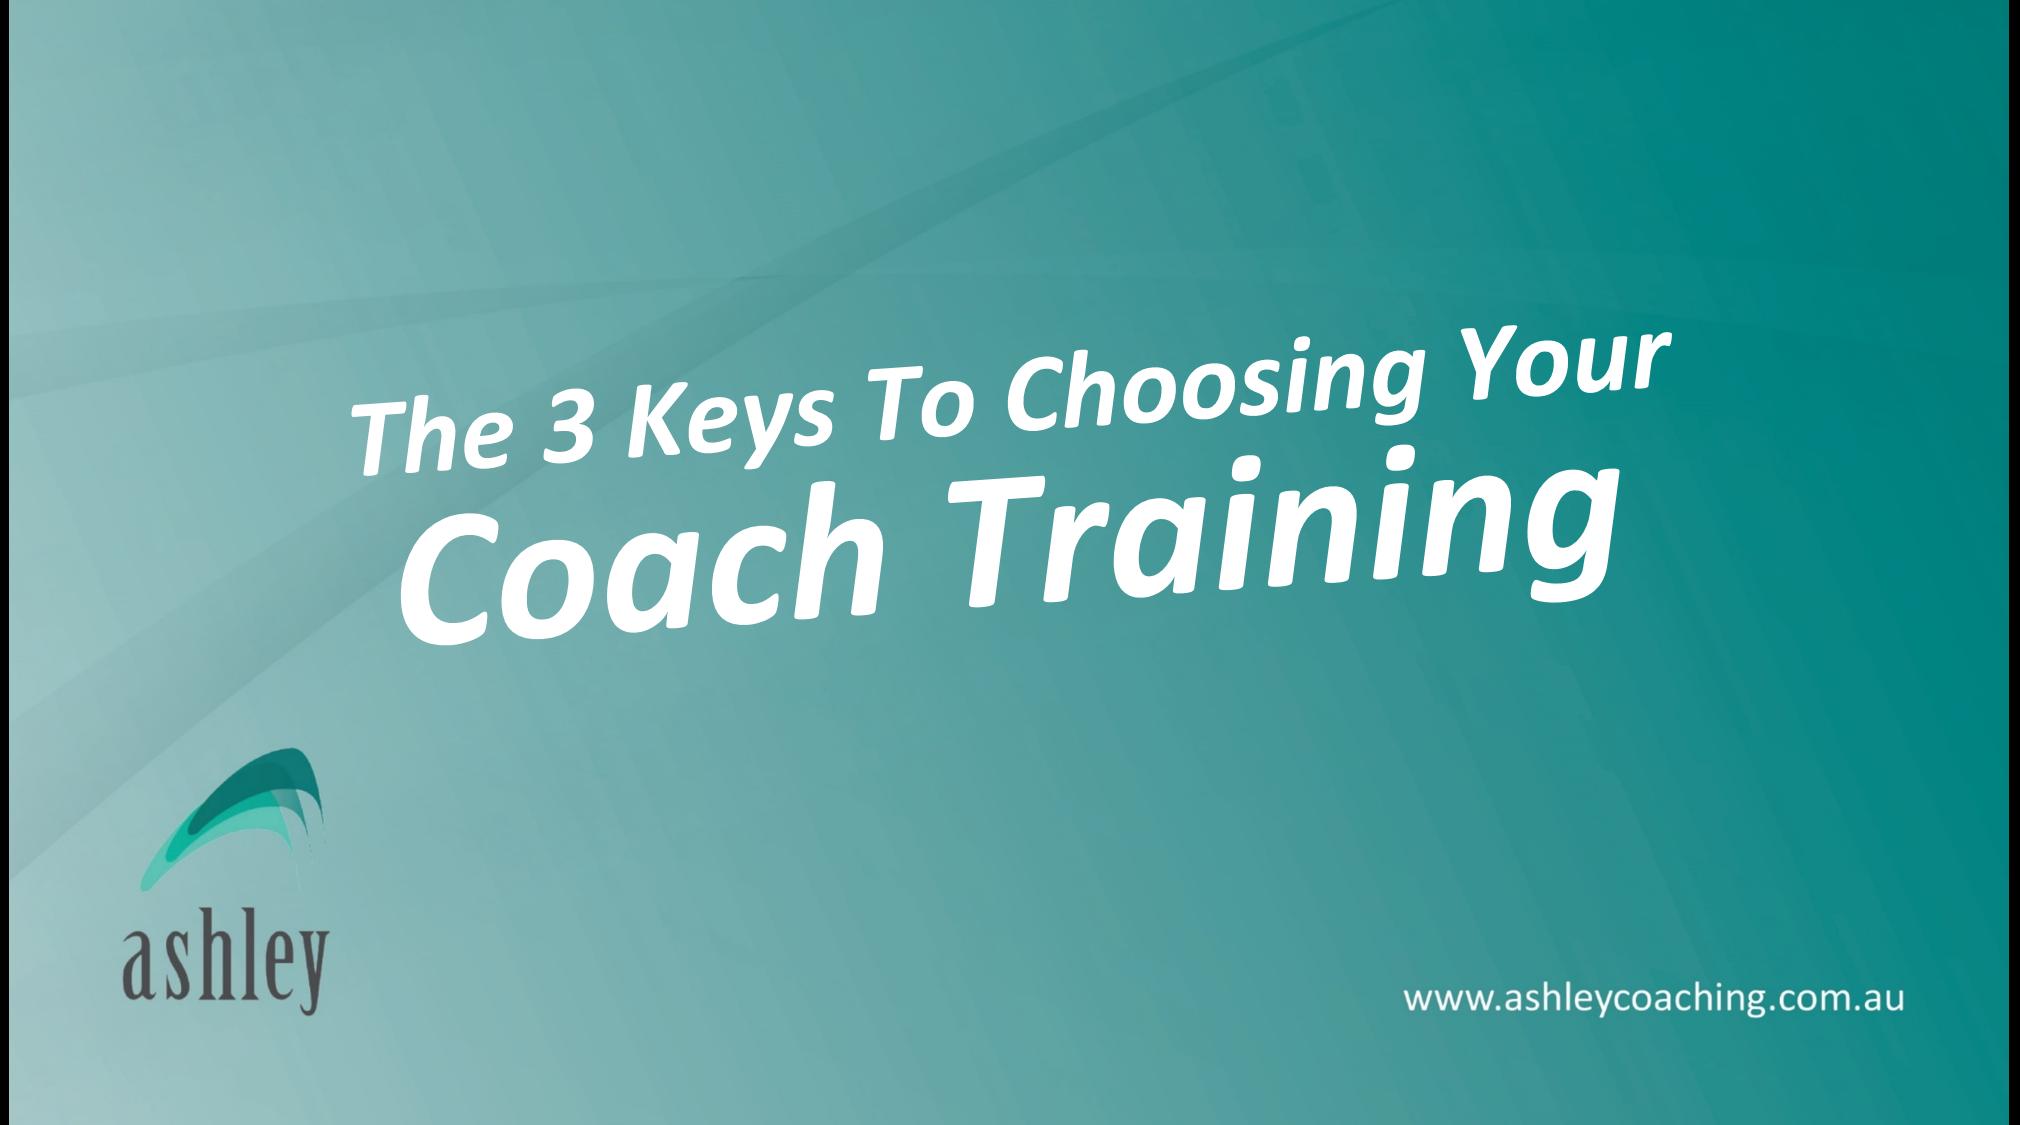 The 3 Keys To Choosing Your Coach Training